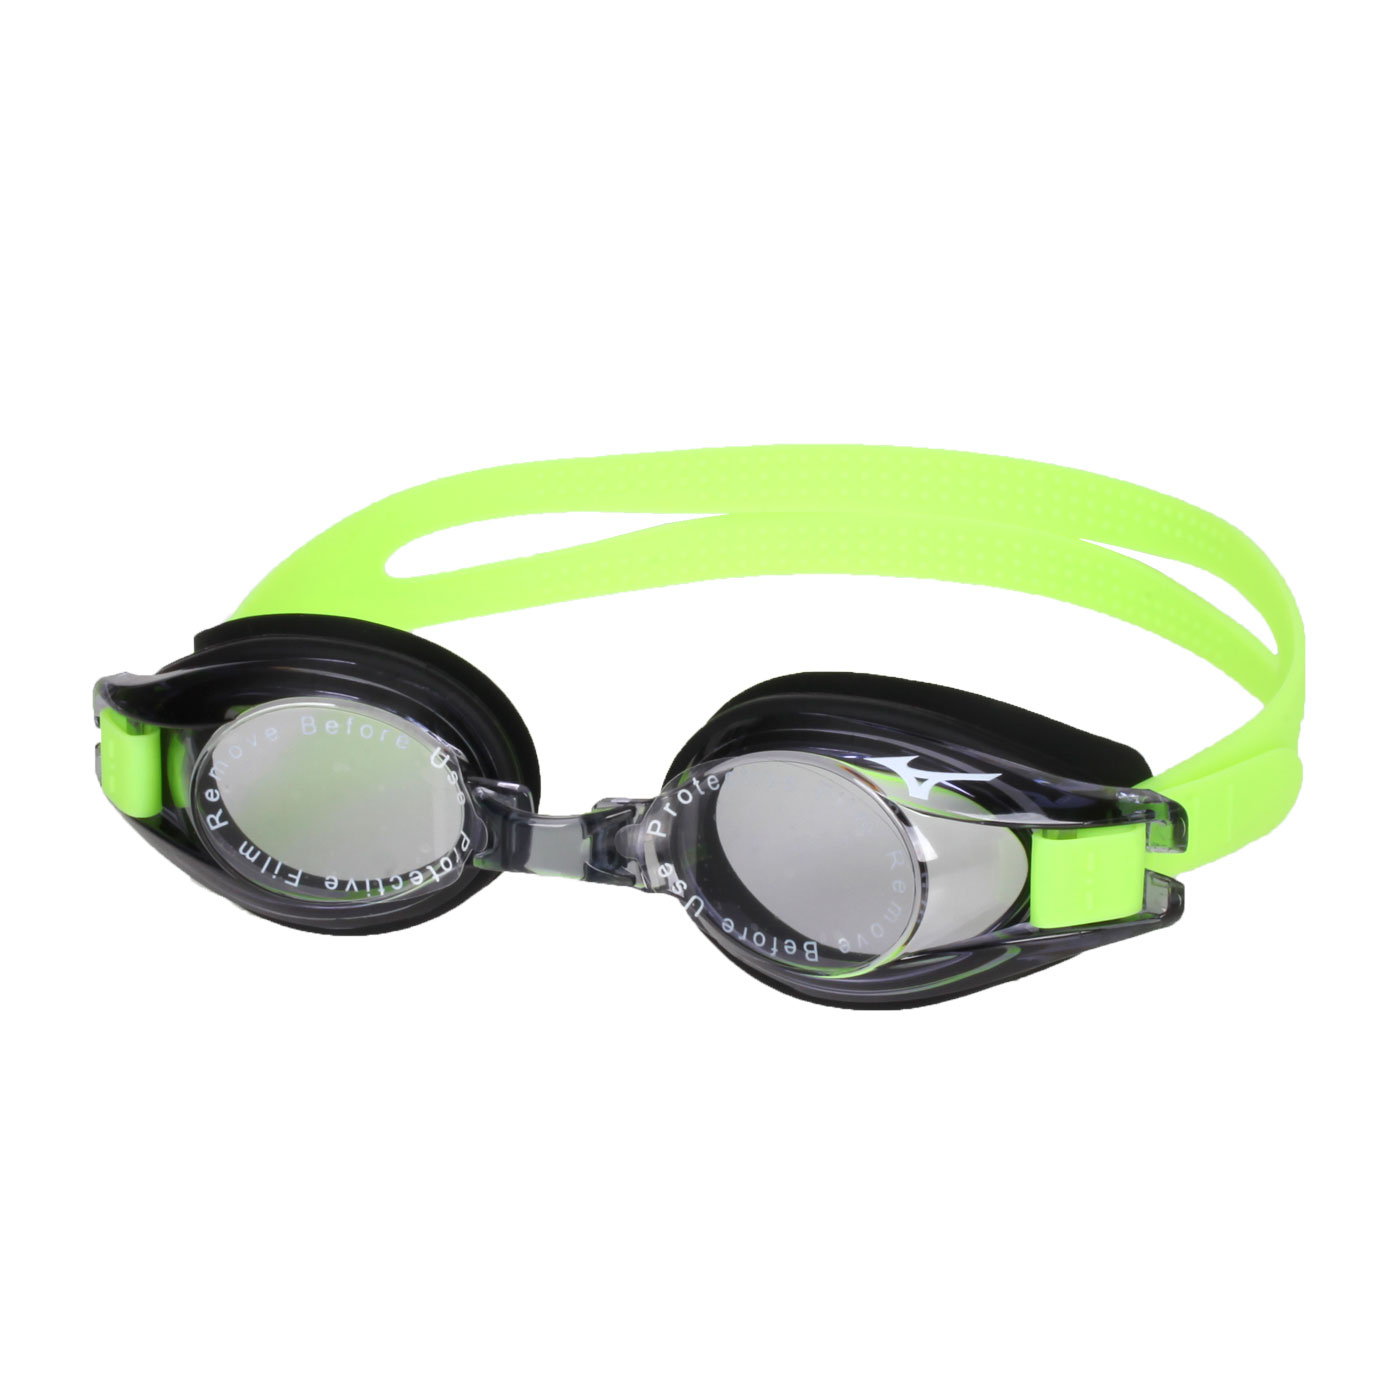 MIZUNO 兒童泳鏡  SWIMN3JF600000-93 - 黑螢光綠